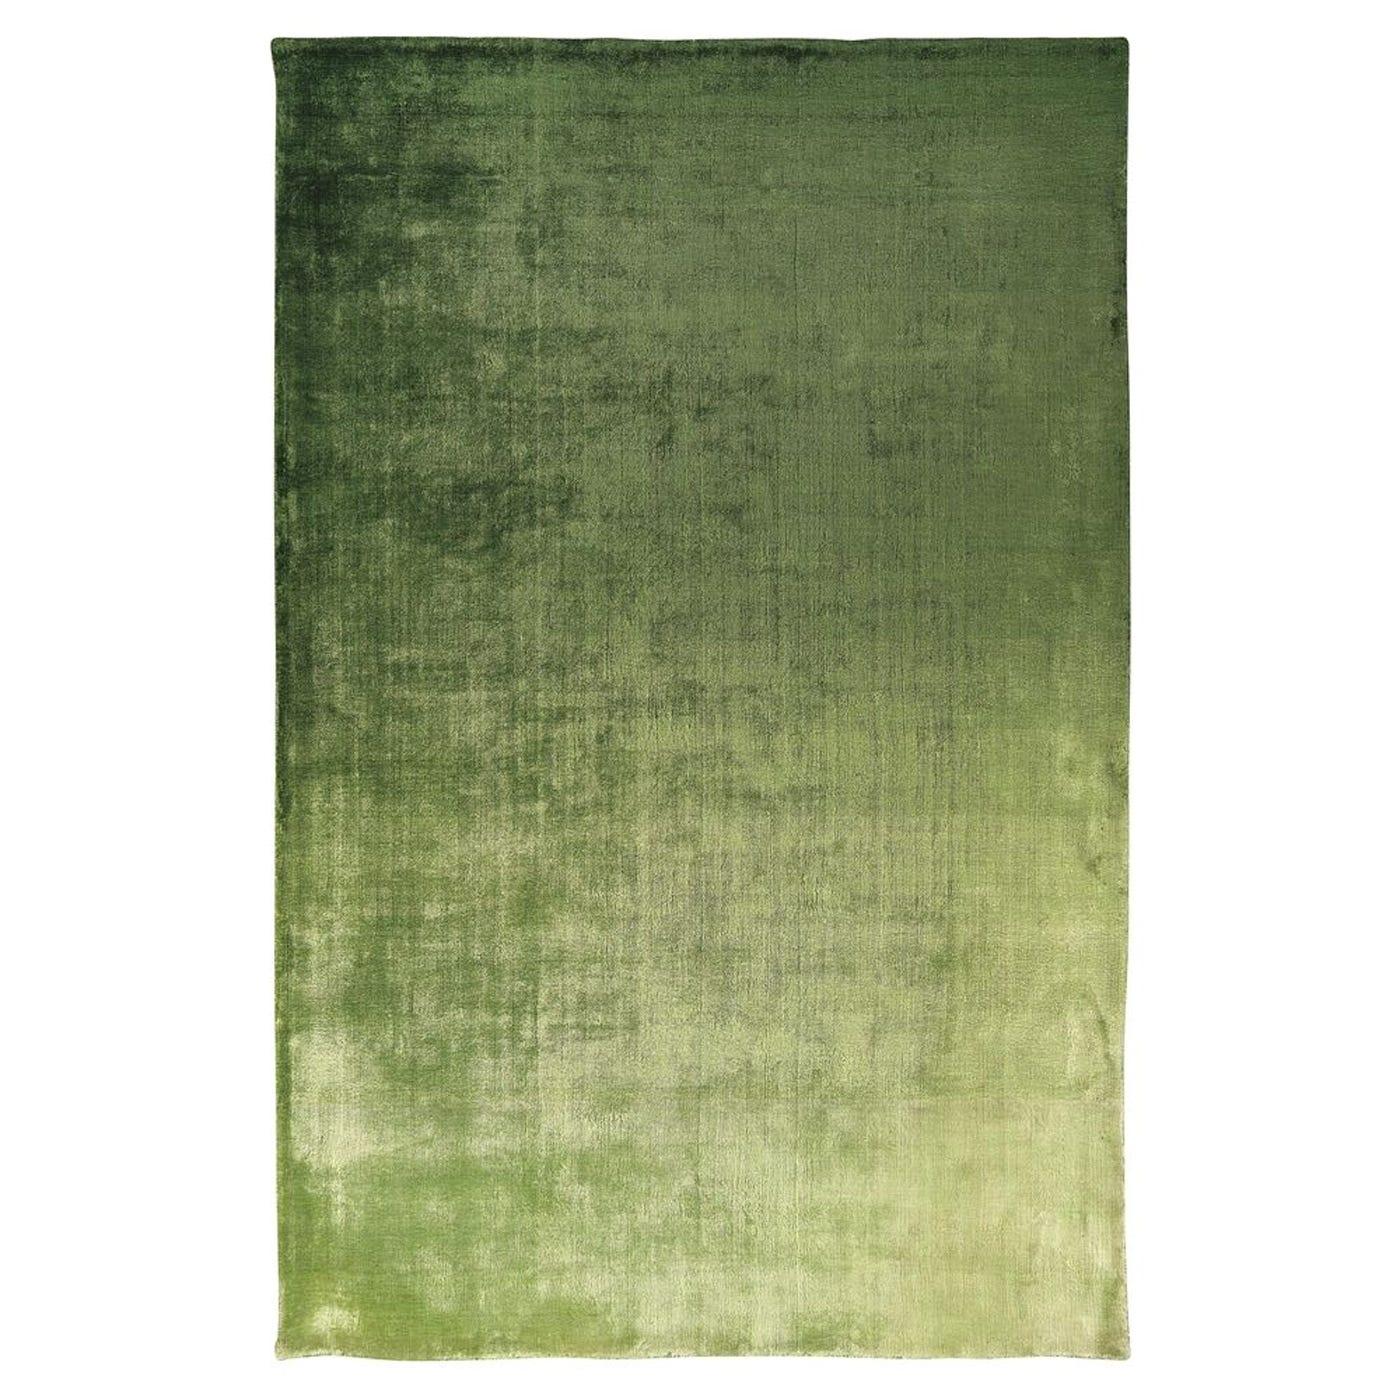 Eberson Rug 160 x 260cm Grass